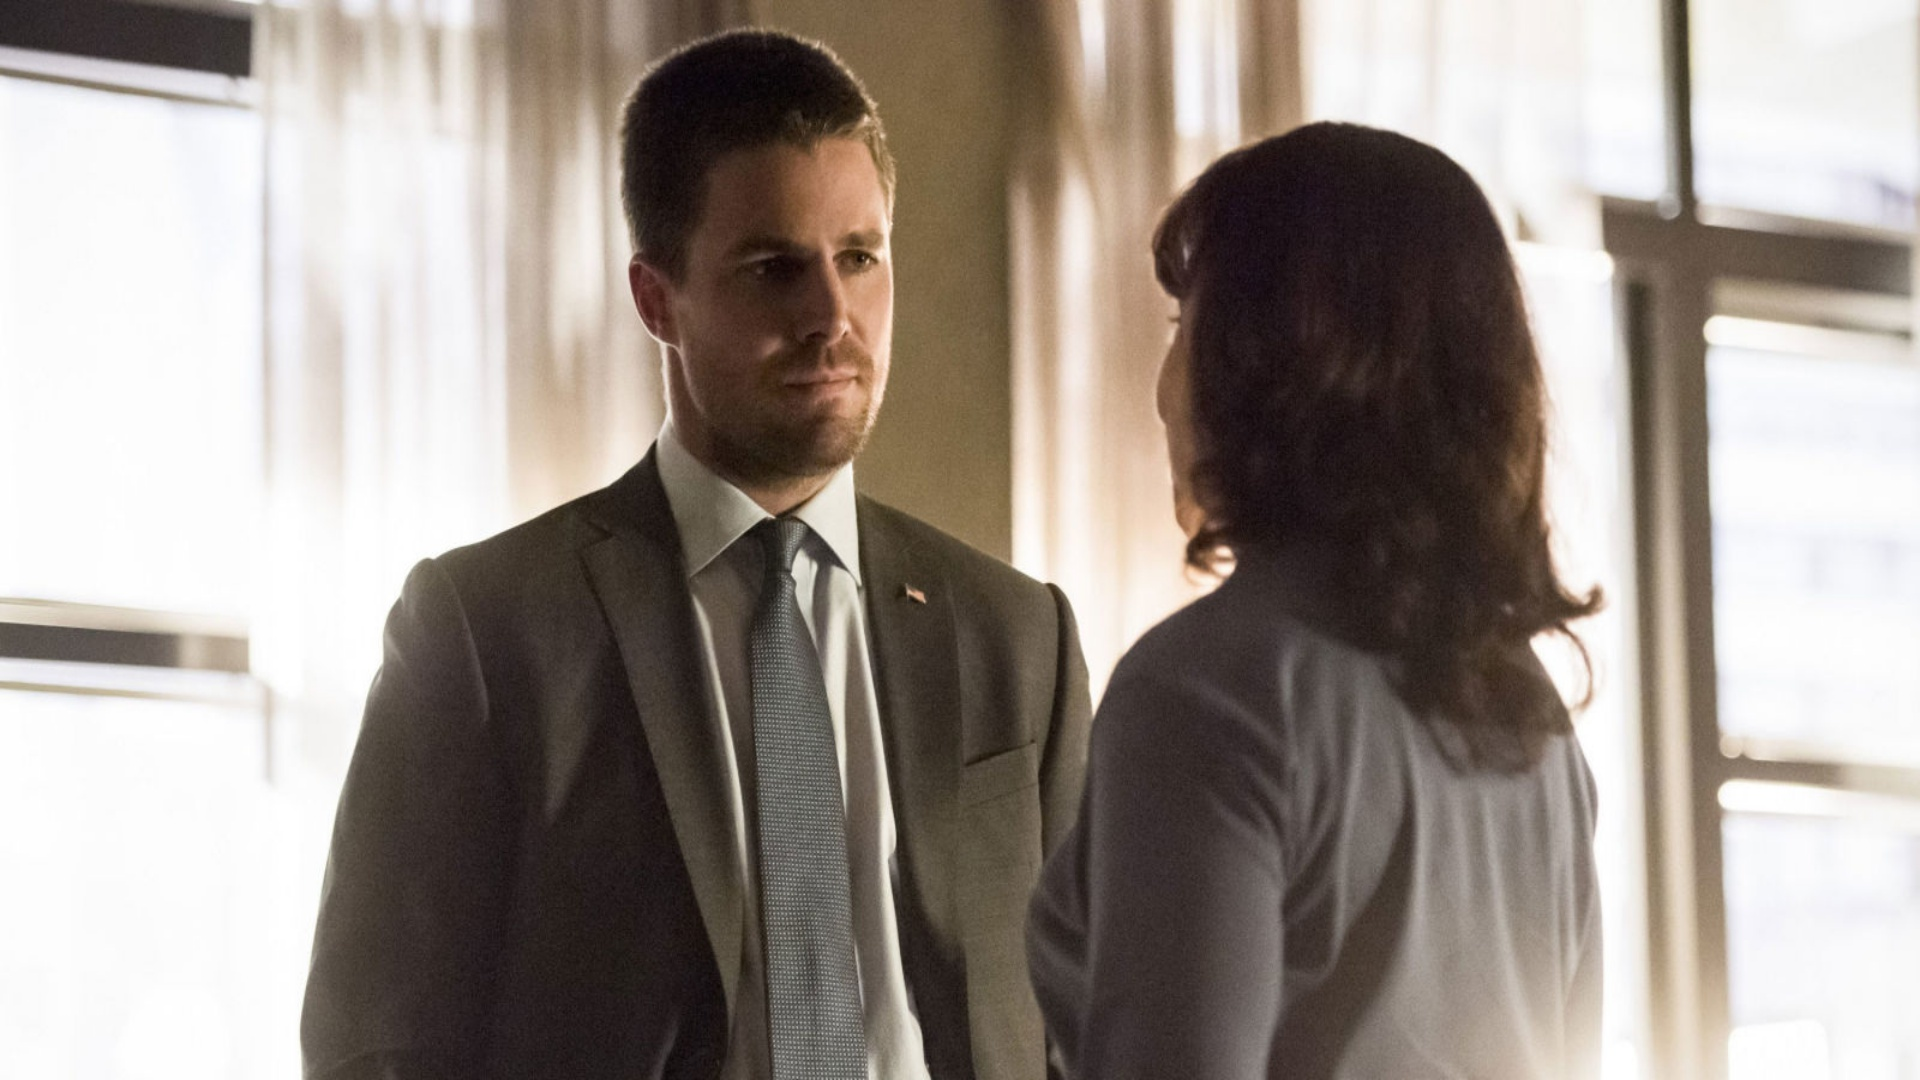 'Arrow' Season 6 Villain: Cayden James on verge of big mistake? Episode 13 tease